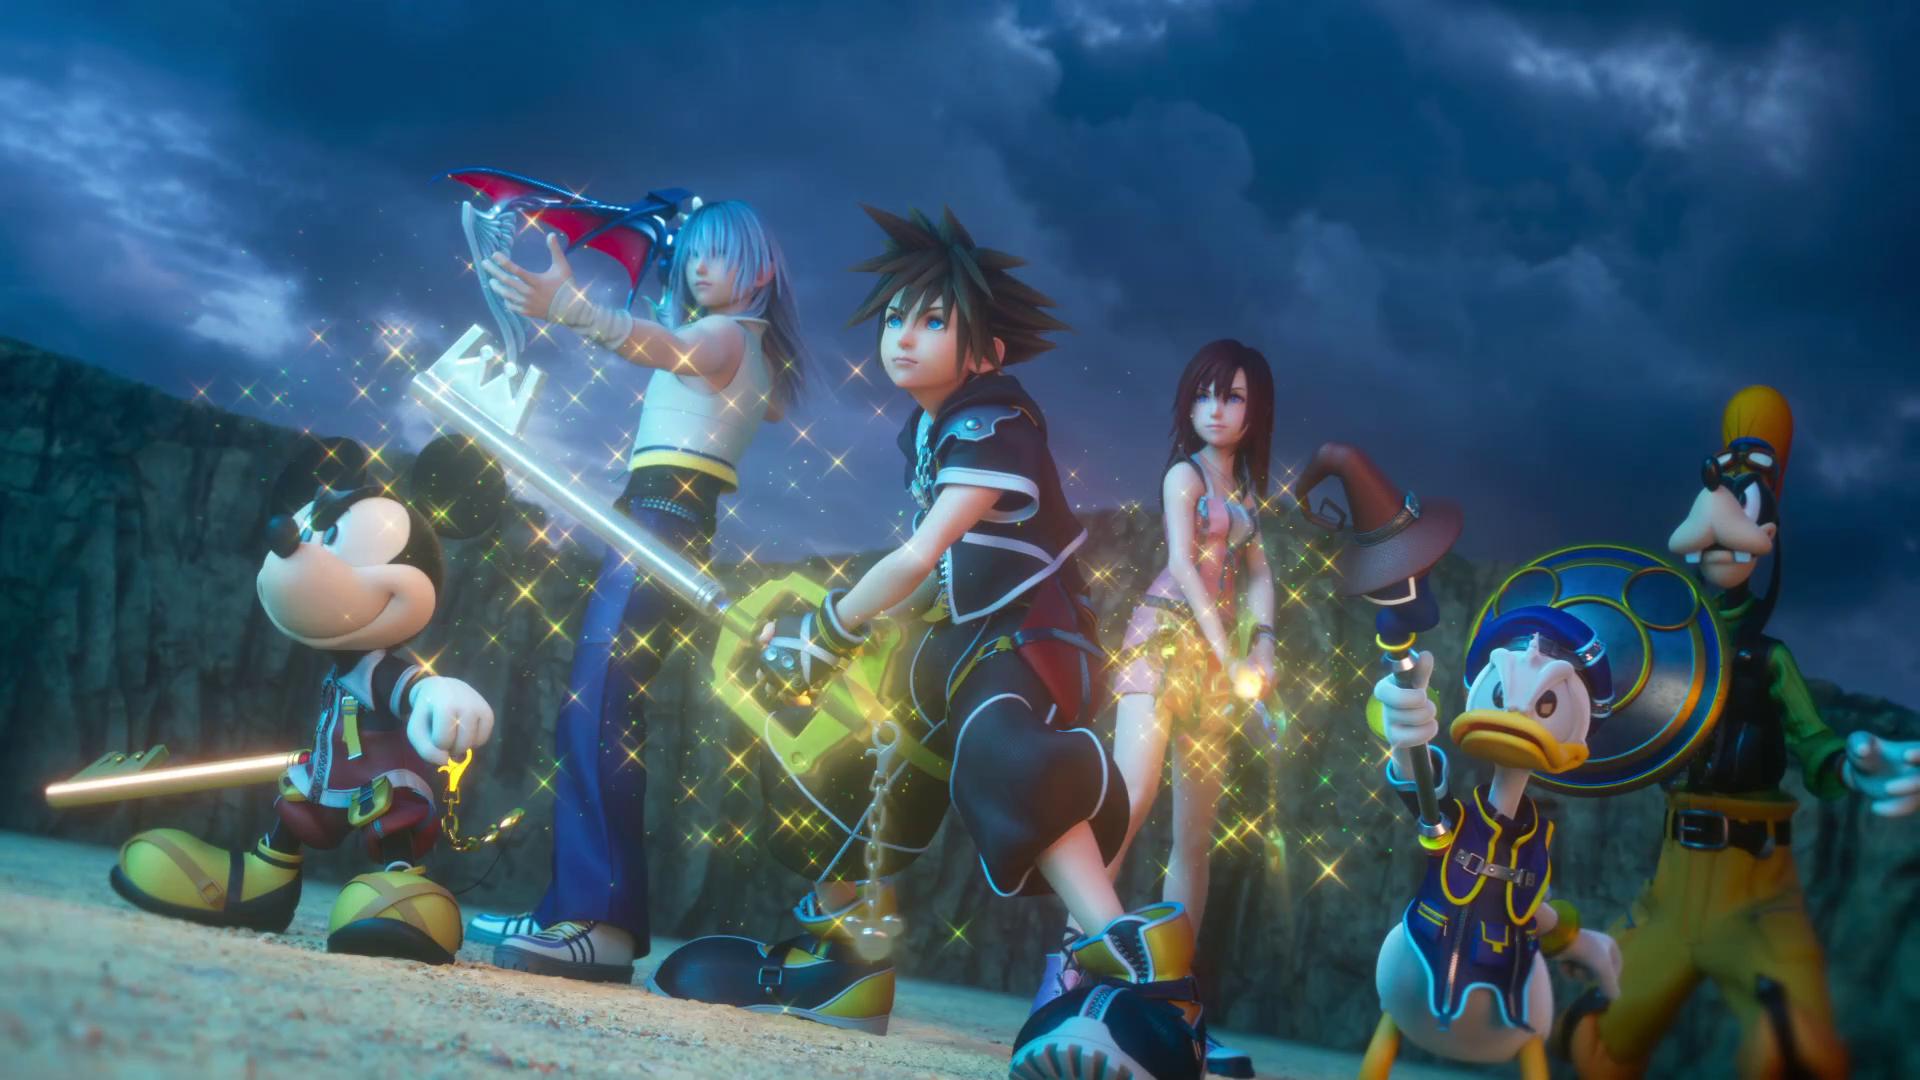 Kingdom Hearts 3 Wallpaper 4k